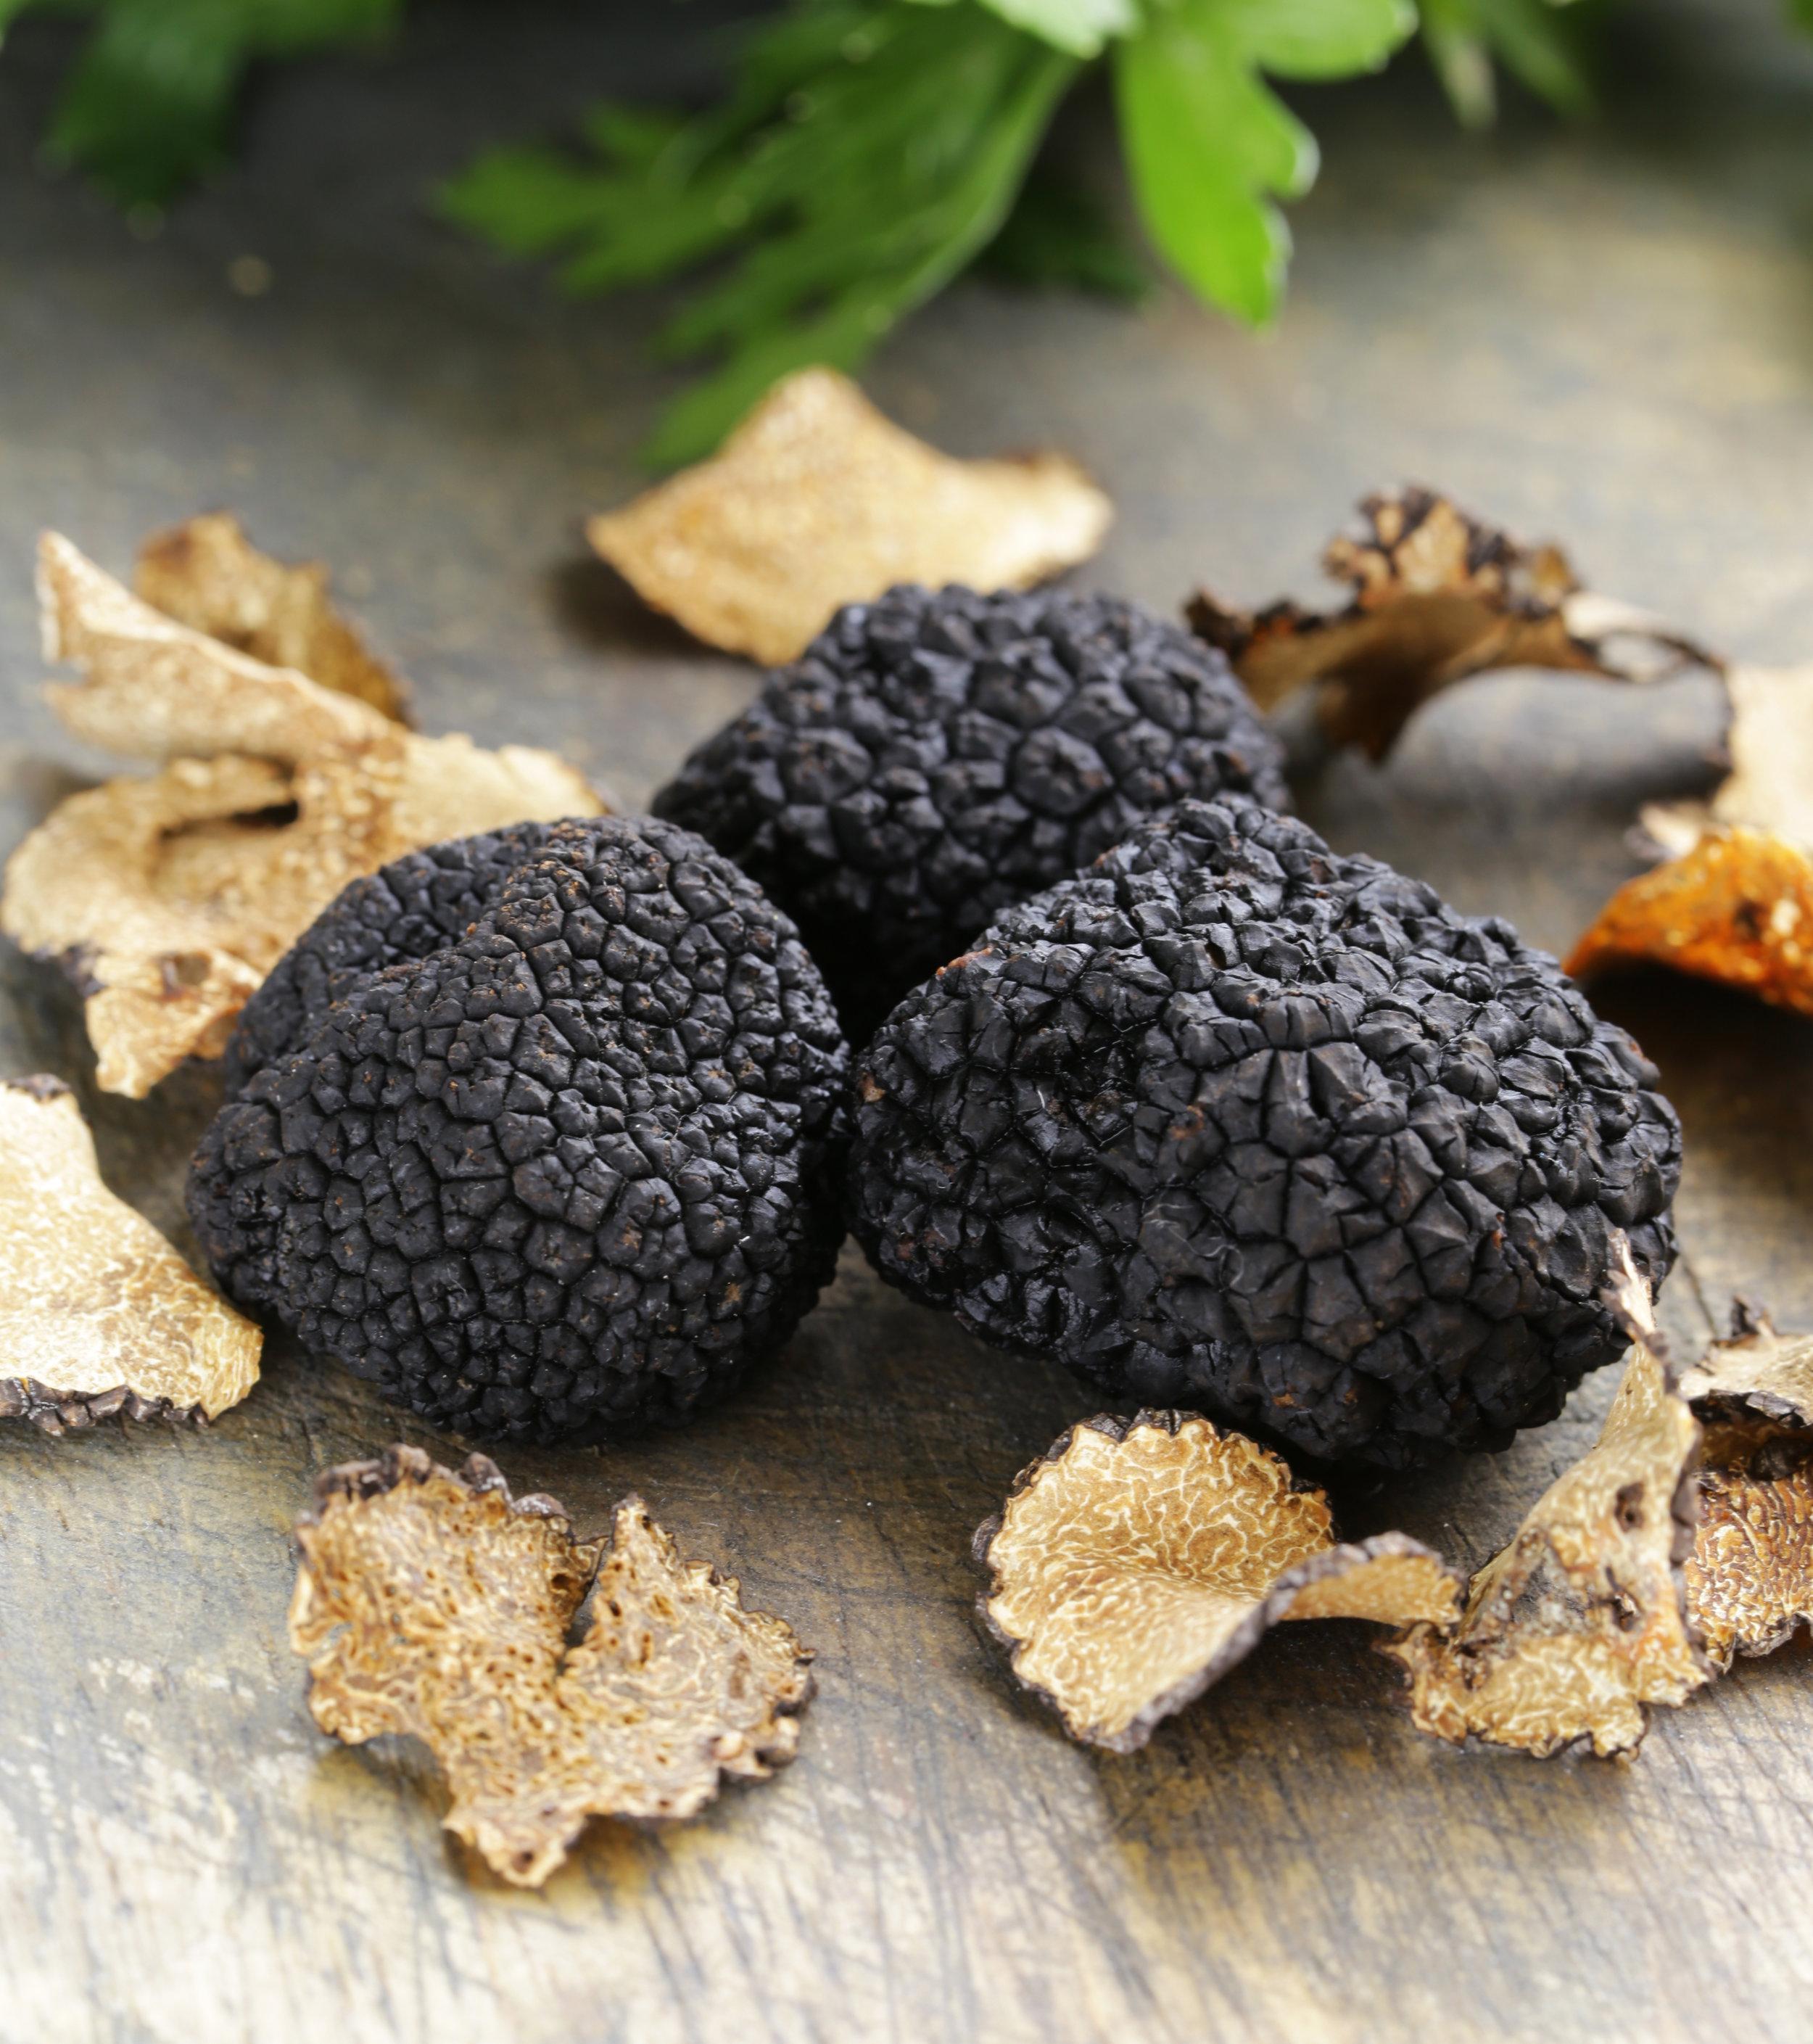 Truffles & Dried Mushrooms